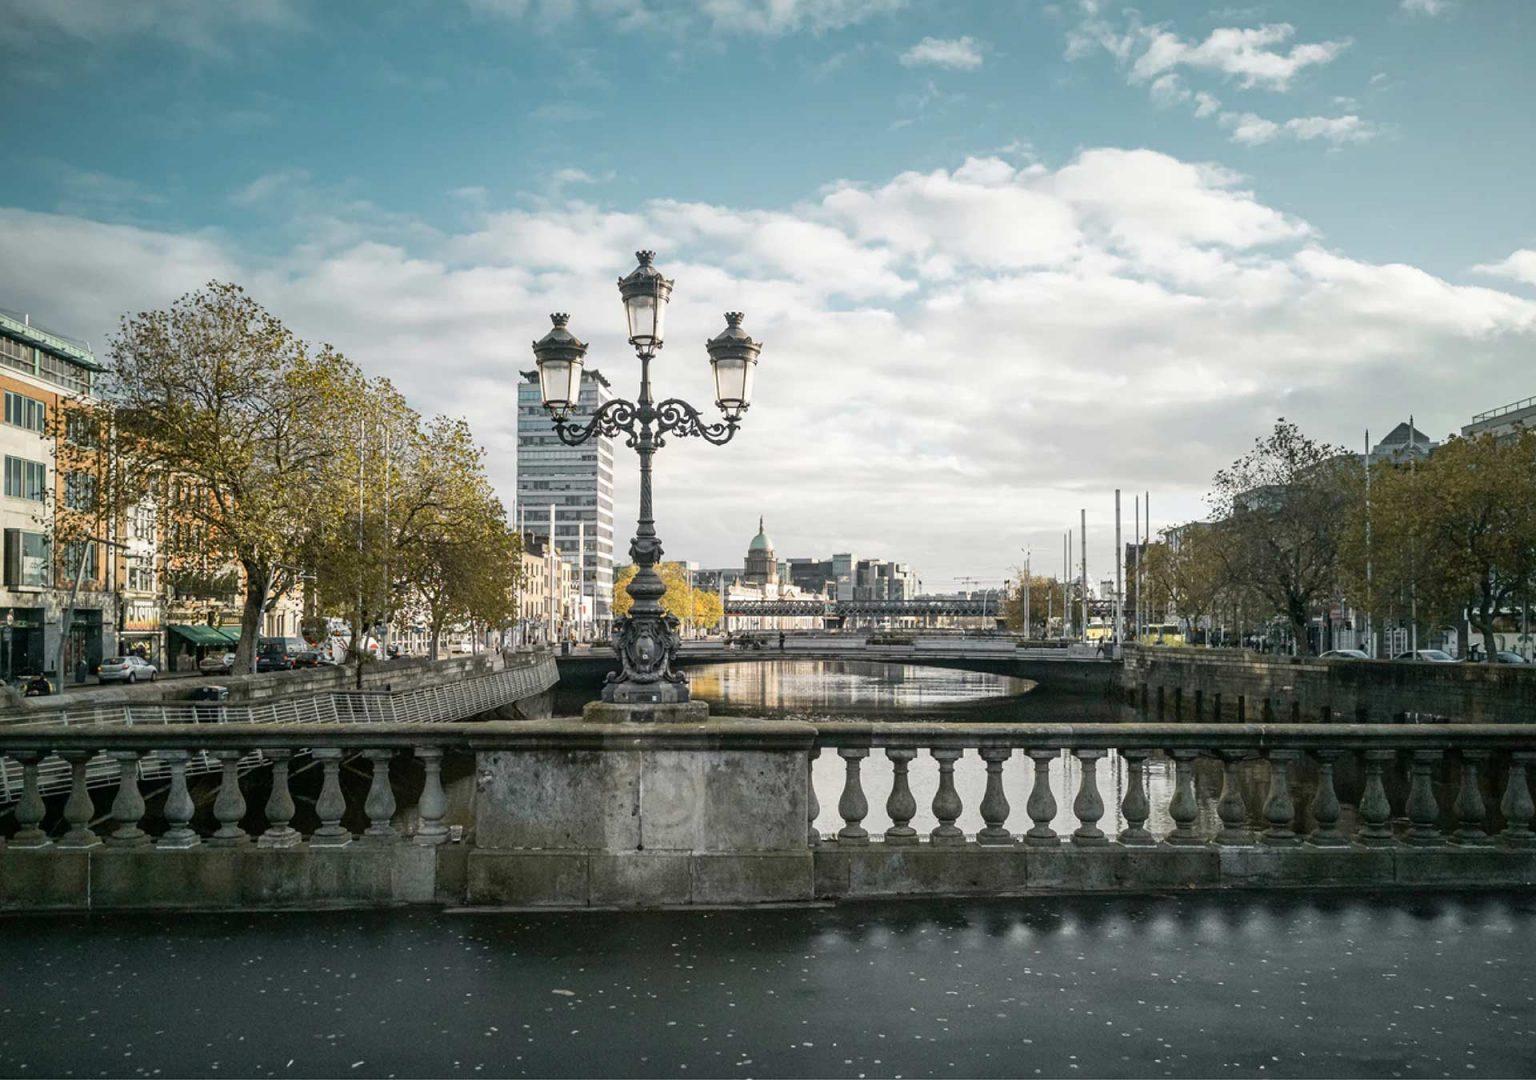 About Smart Dublin